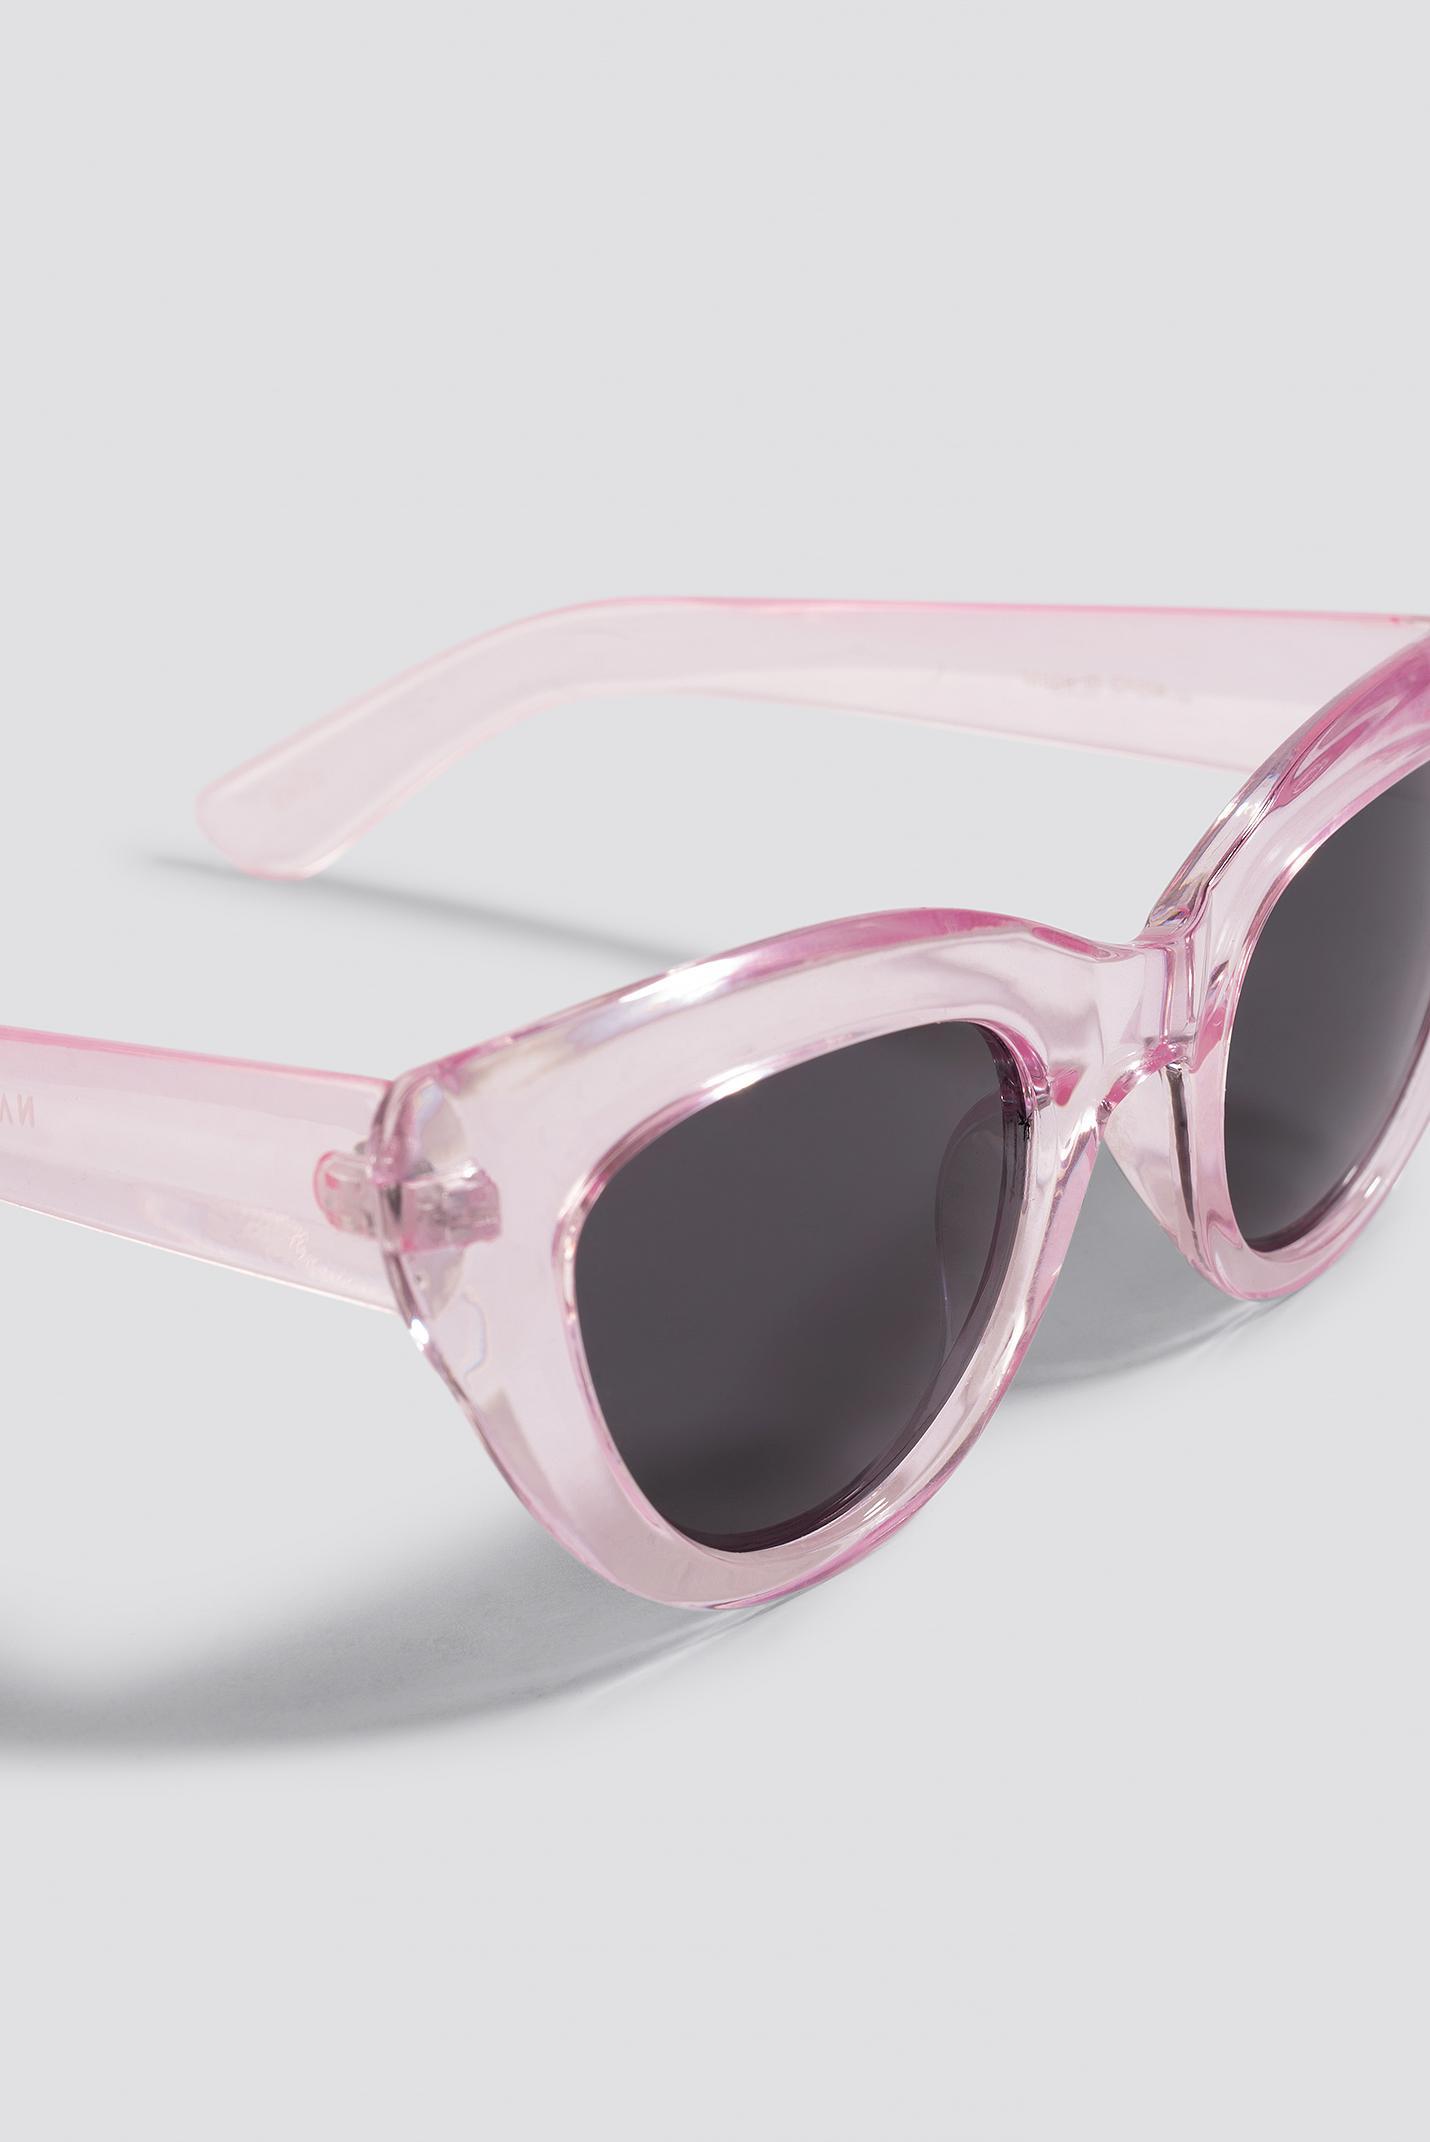 ccb595ba3e ... Cat Eye Sunglasses Light Pink - Lyst. View fullscreen